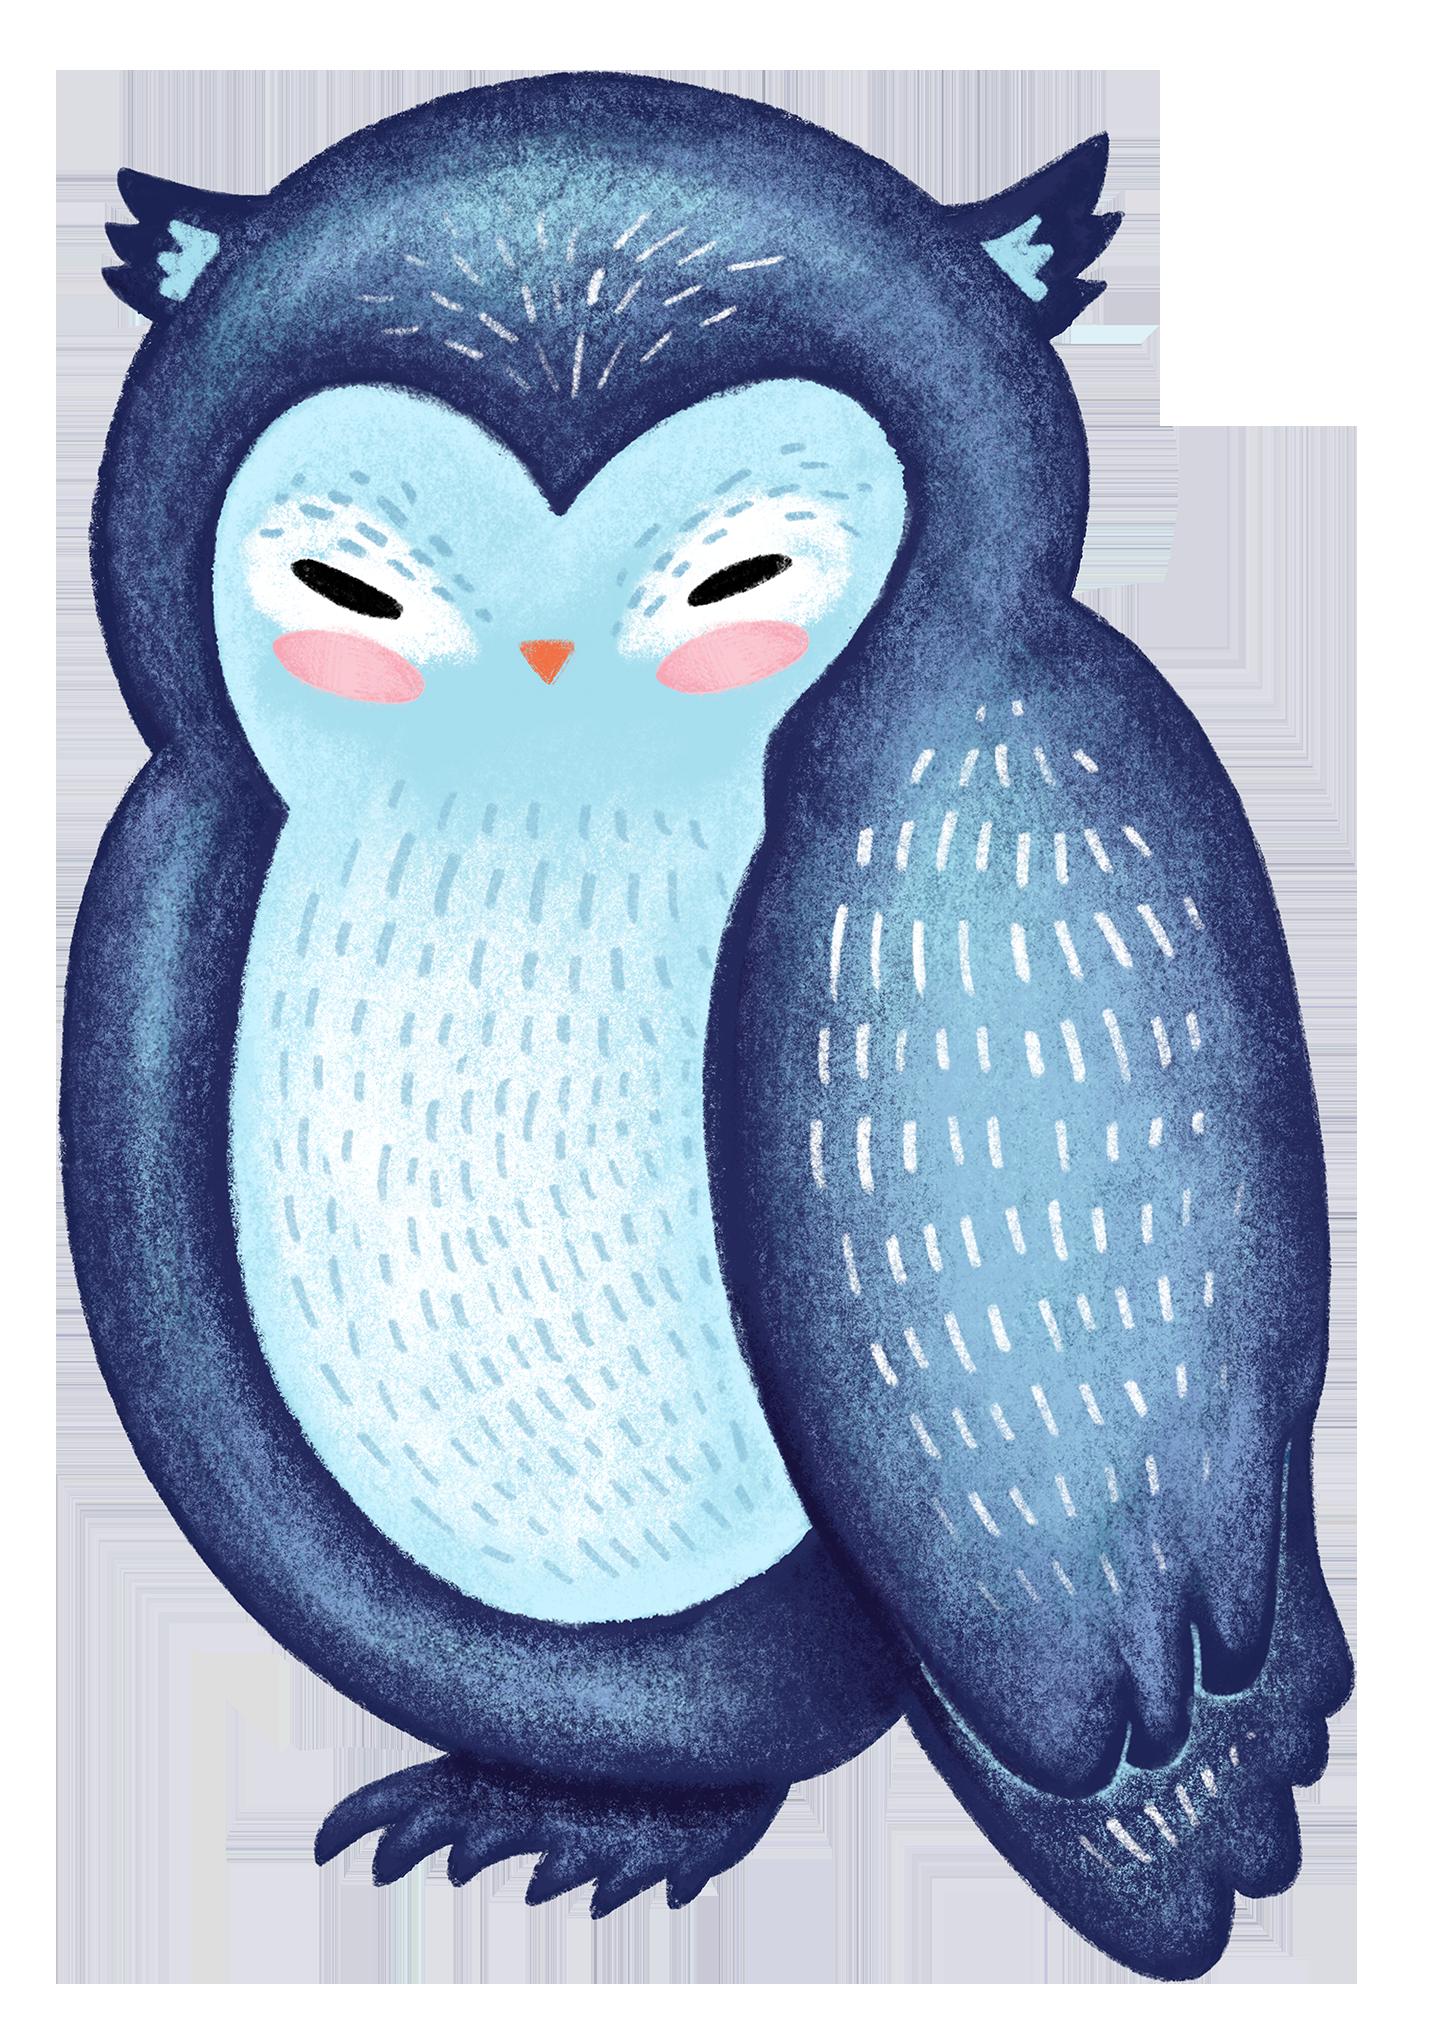 OWL_FINAL.png